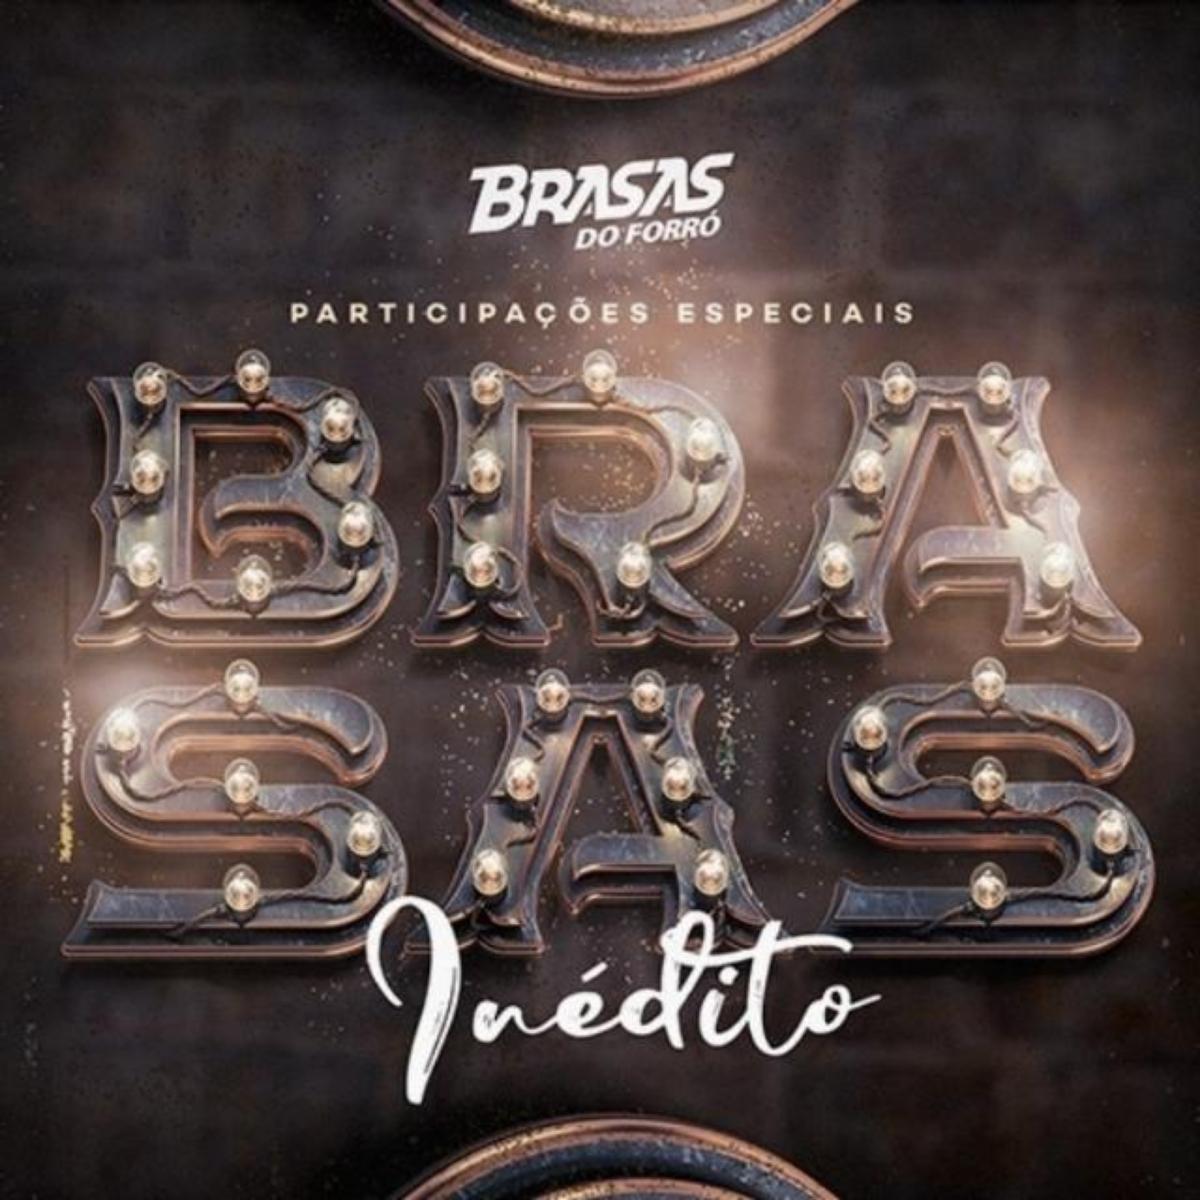 CD ACESO BAIXAR CALANGO